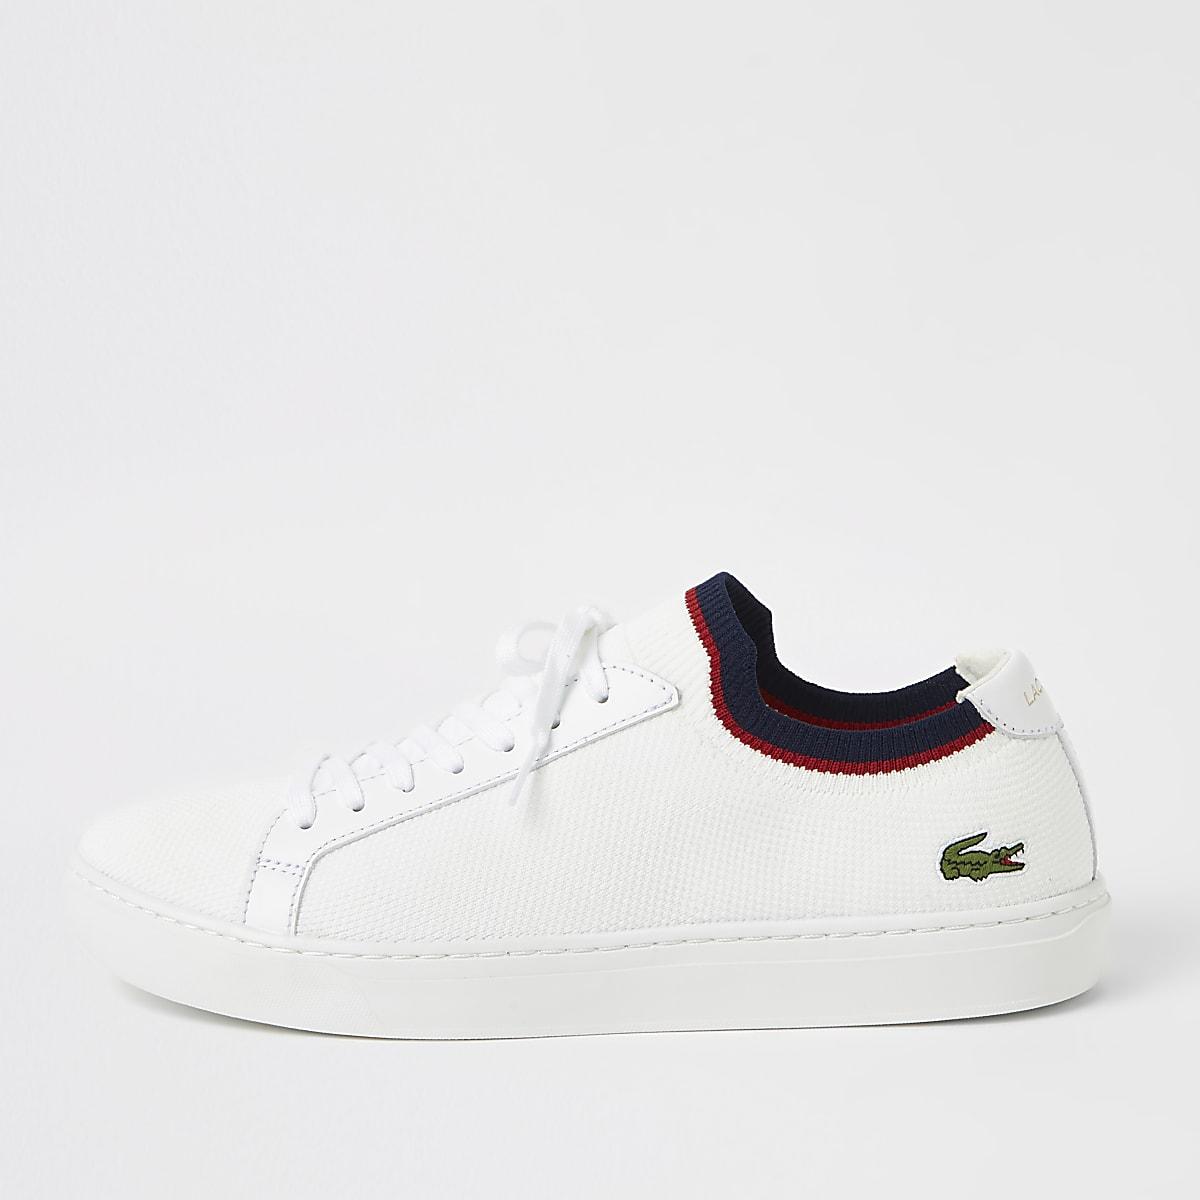 Lacoste white textile sneakers